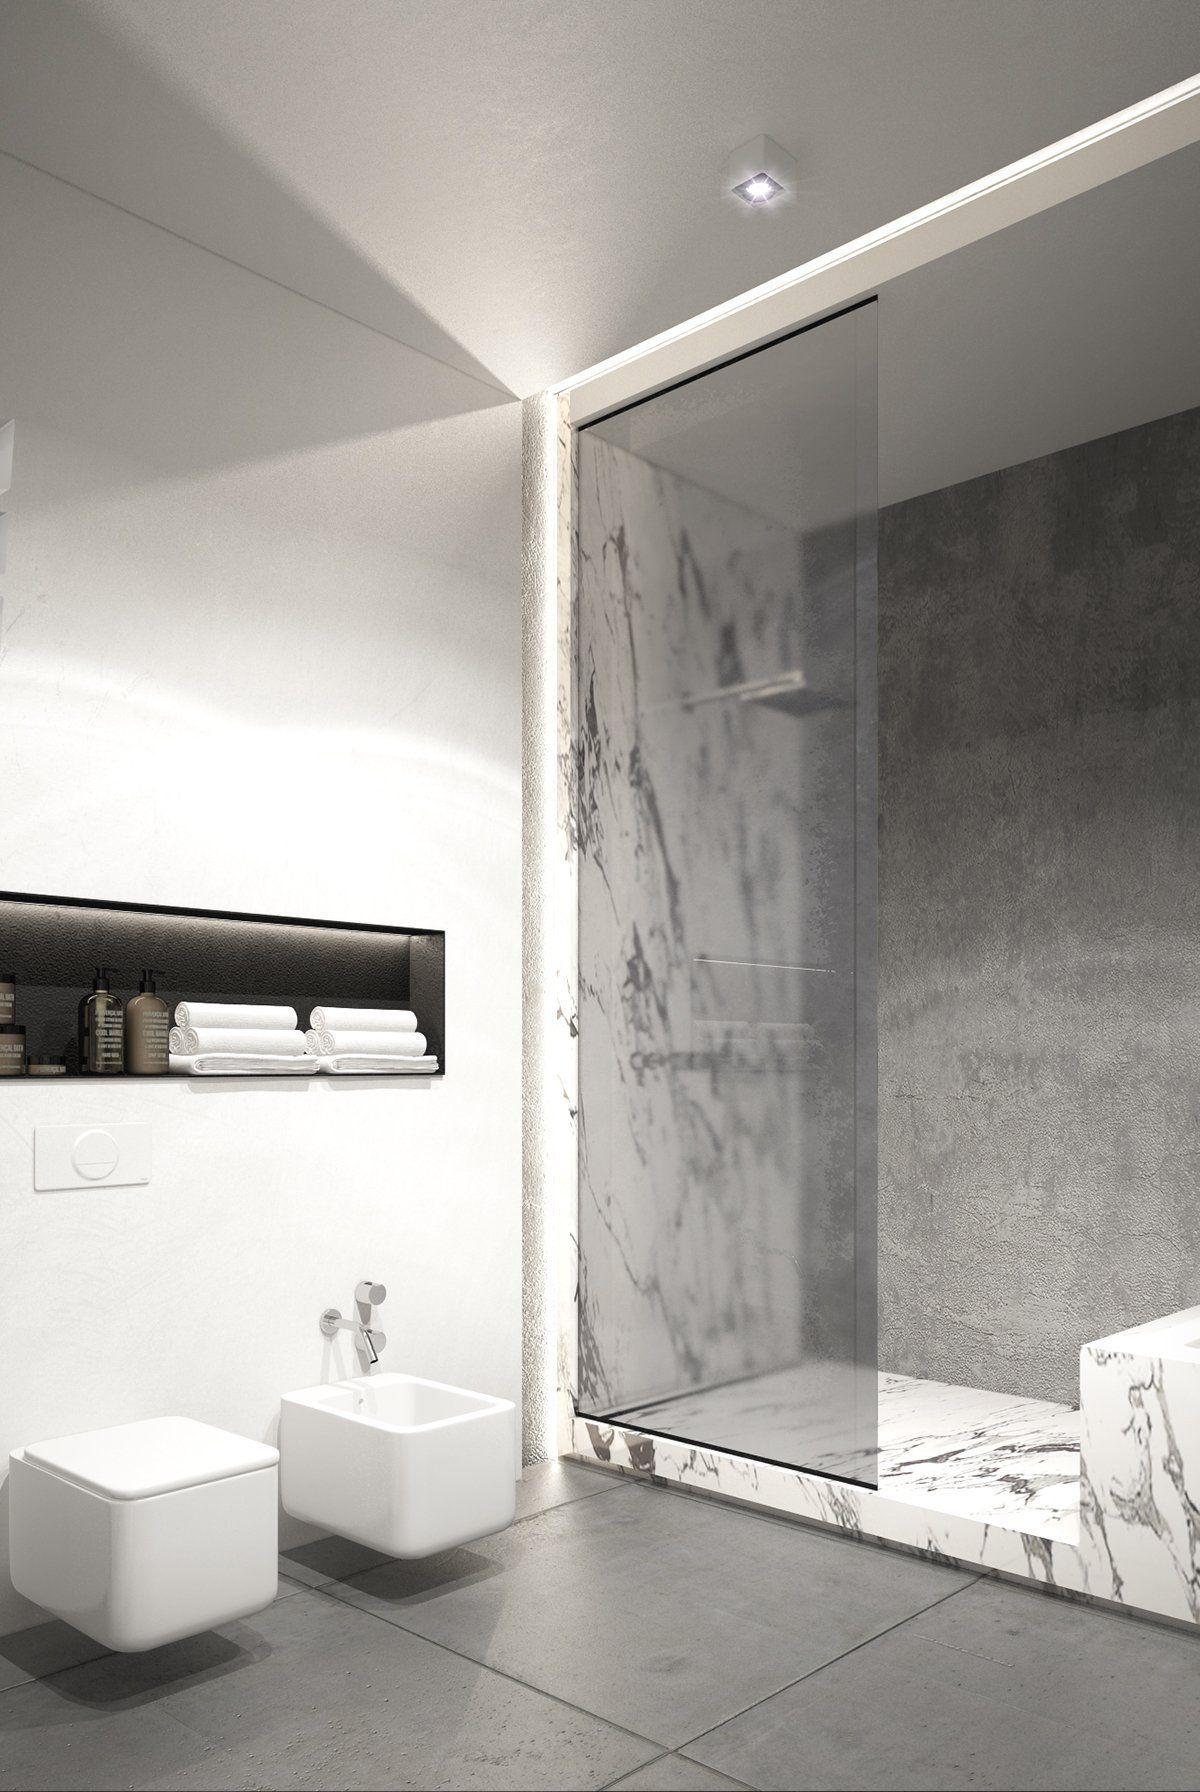 Exposed concrete walls ideas inspiration ideas for interior pinterest salle de bain for Exposed concrete walls interior